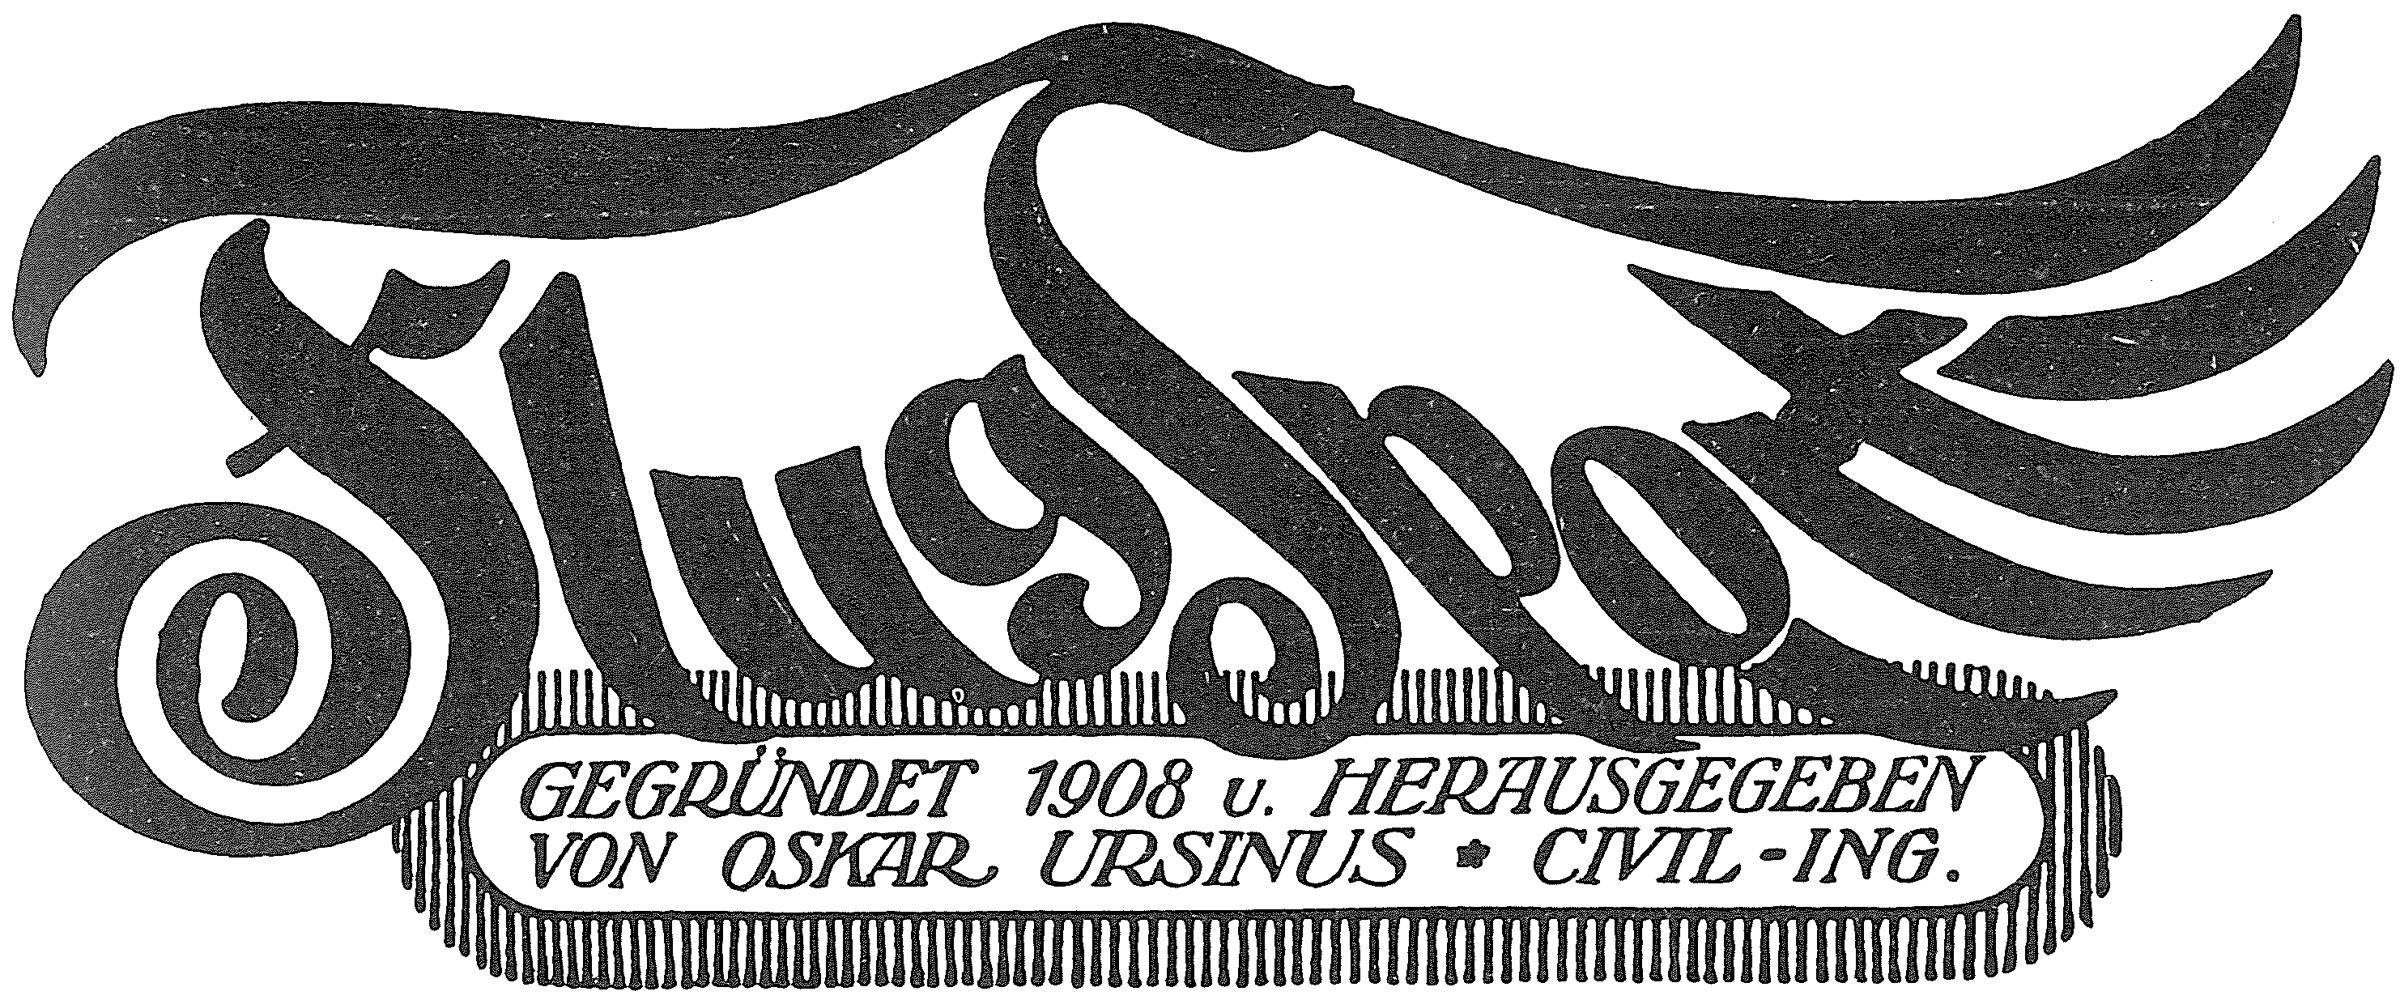 Zeitschrift Flugsport 1928: Luftfahrt - Motorflug pour Atelier Autonome Grande Section